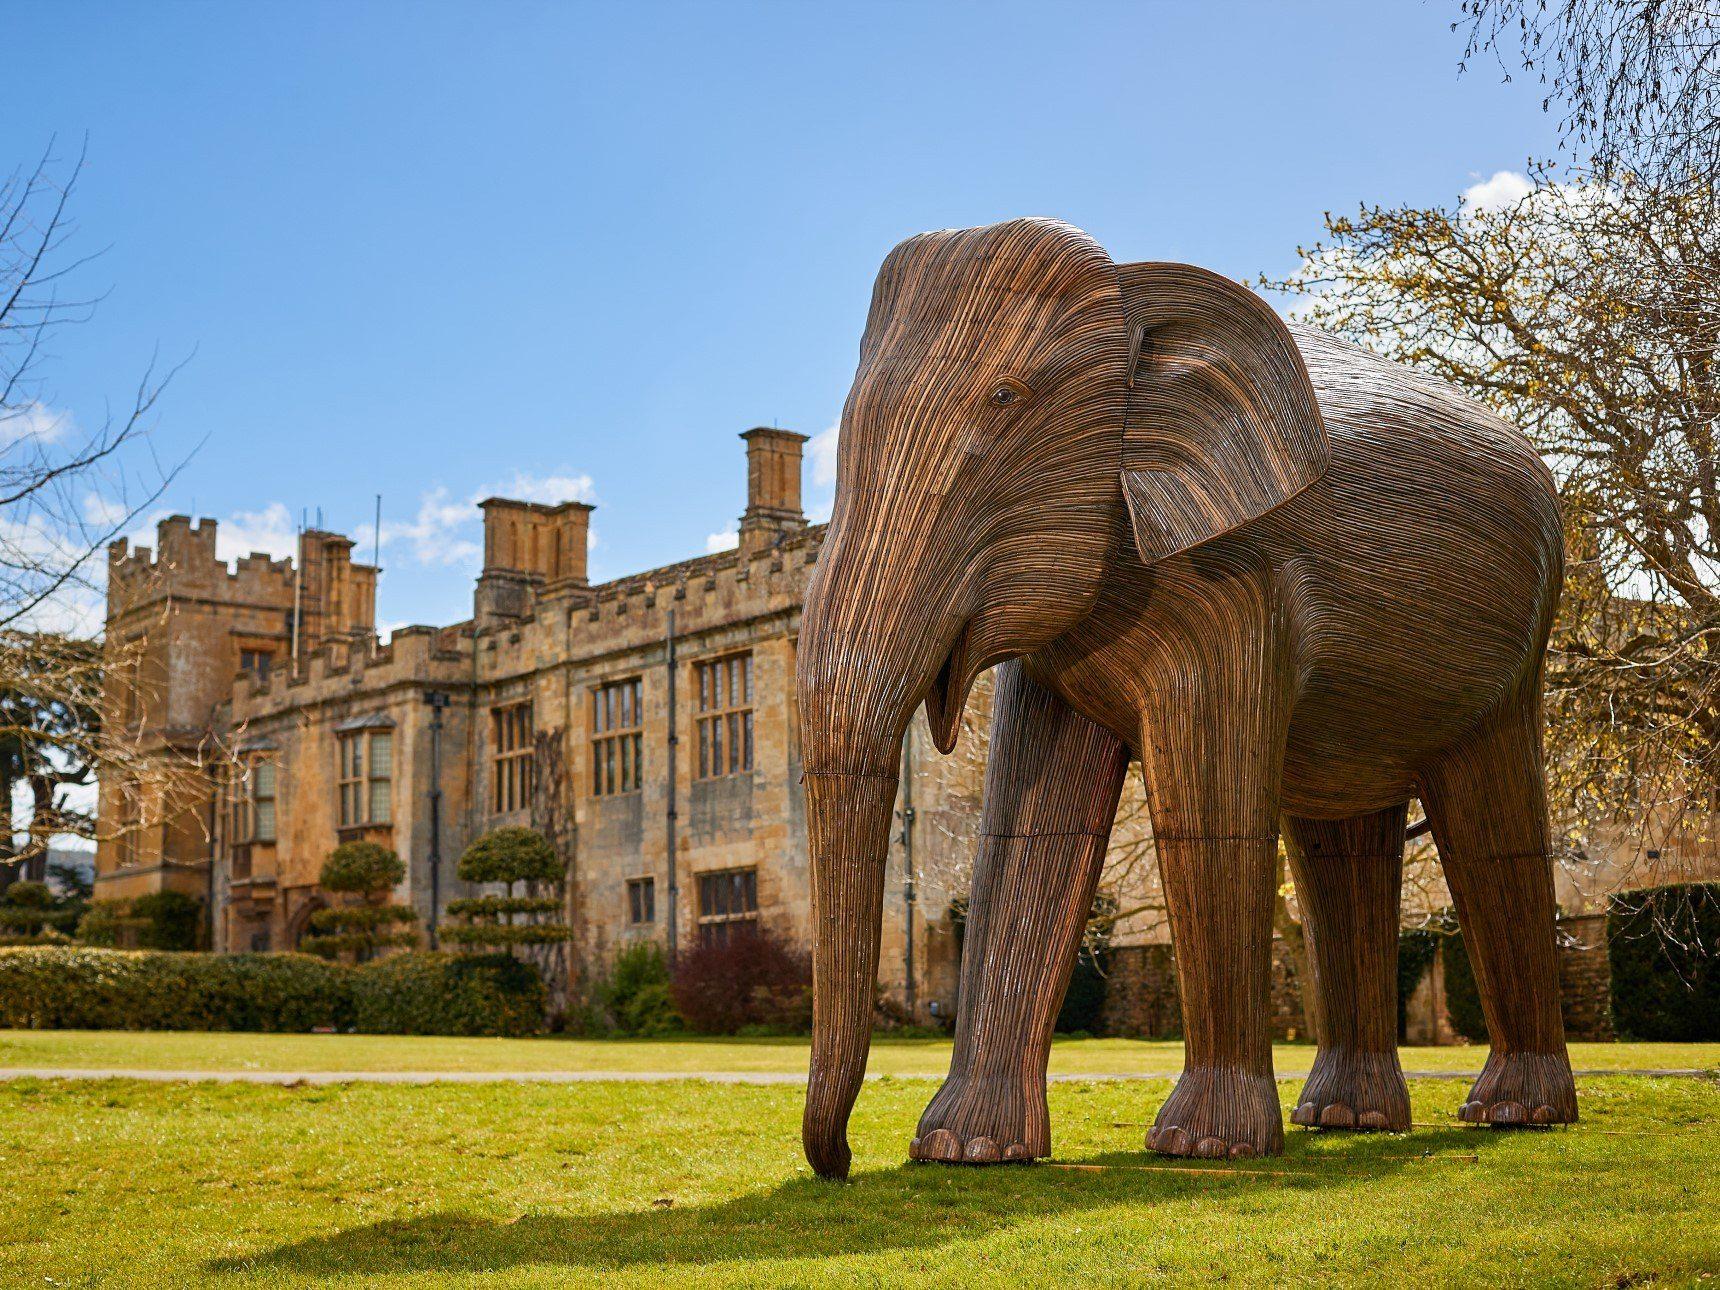 Large Bachelor Elephant sculpture in front of castle